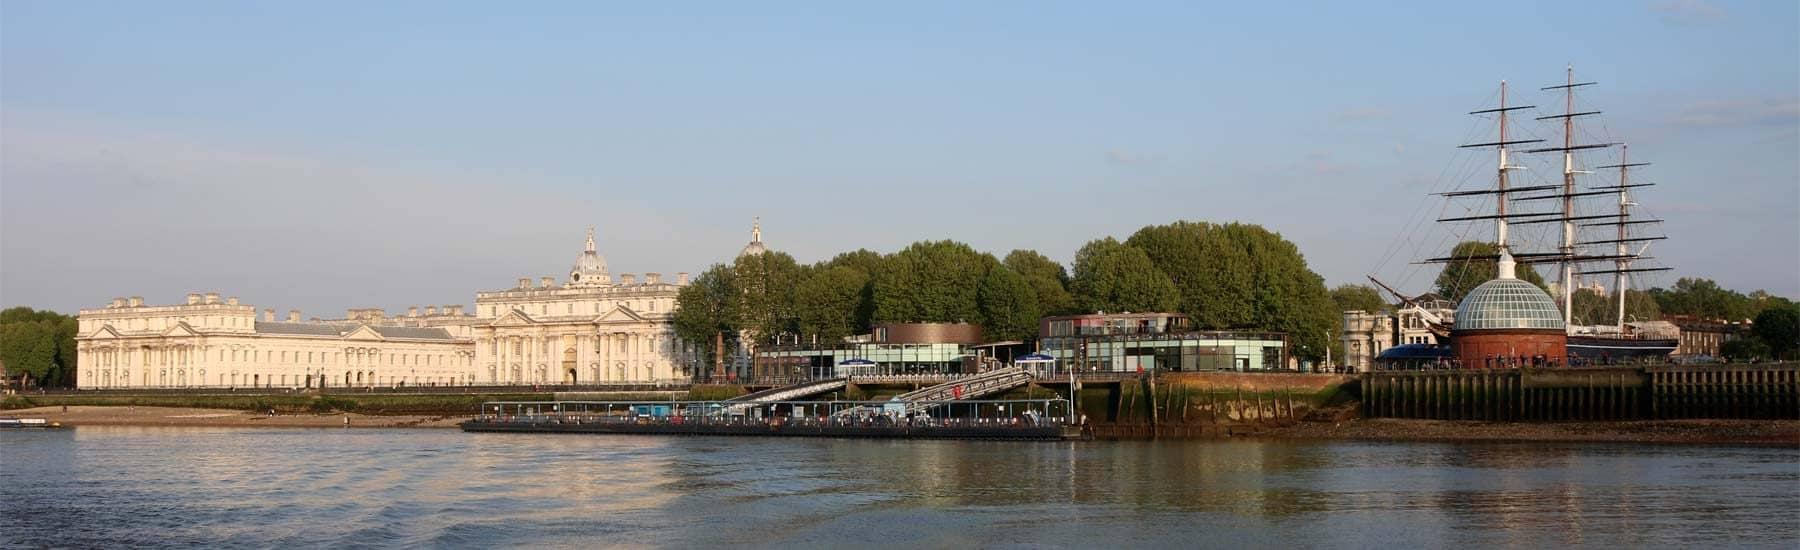 Thames River Sightseeing, Royal Borough of Greenwich